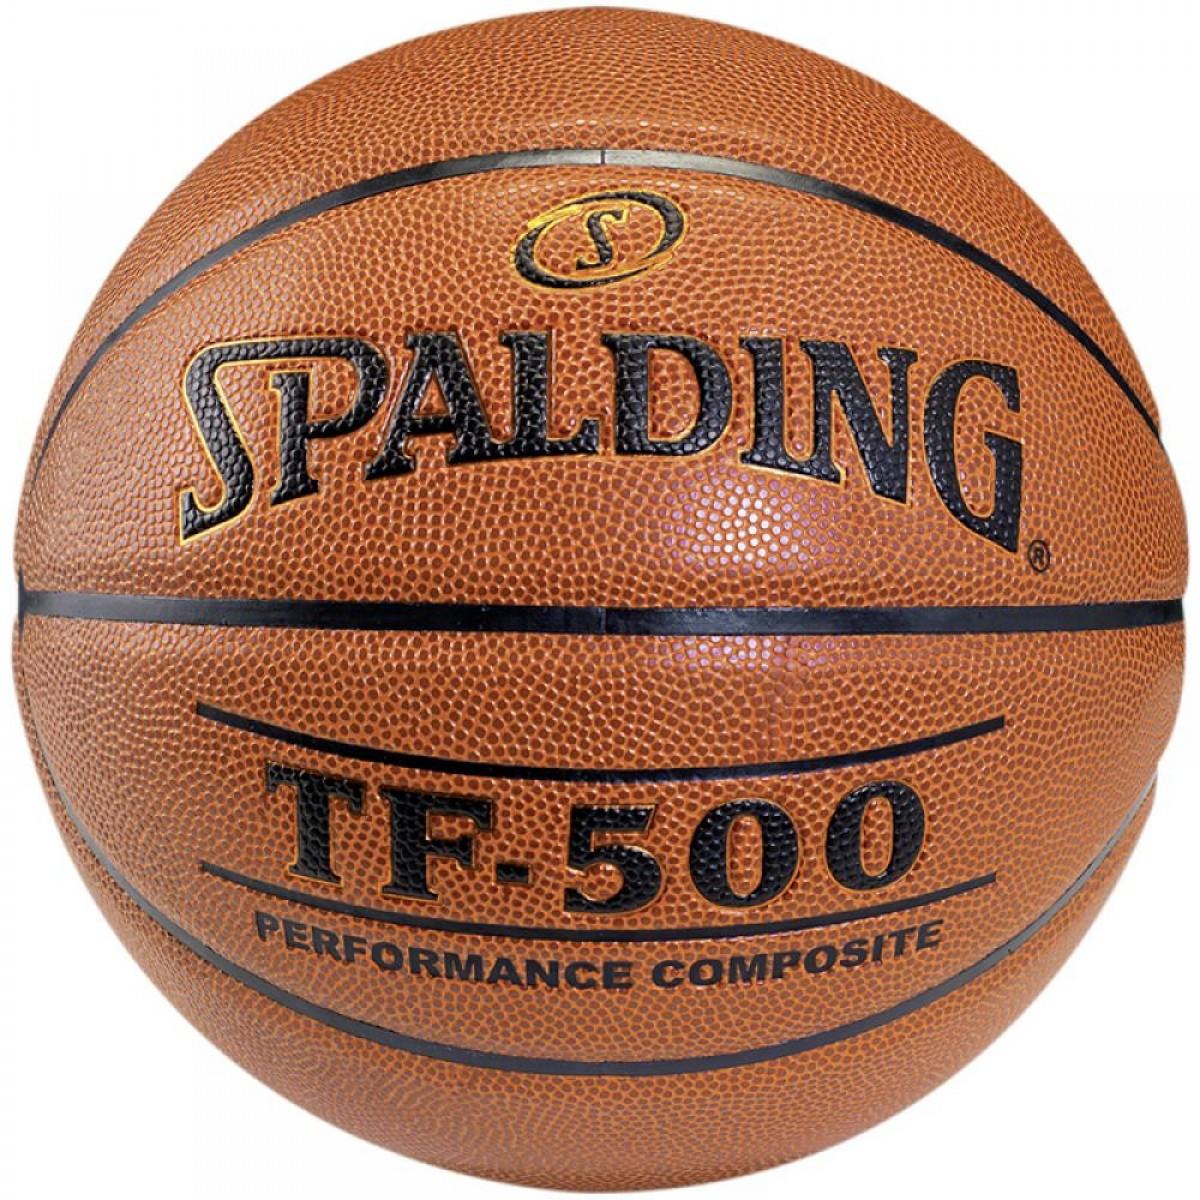 М'яч баскетбольний Spalding TF-500 IN / OUT Size 7